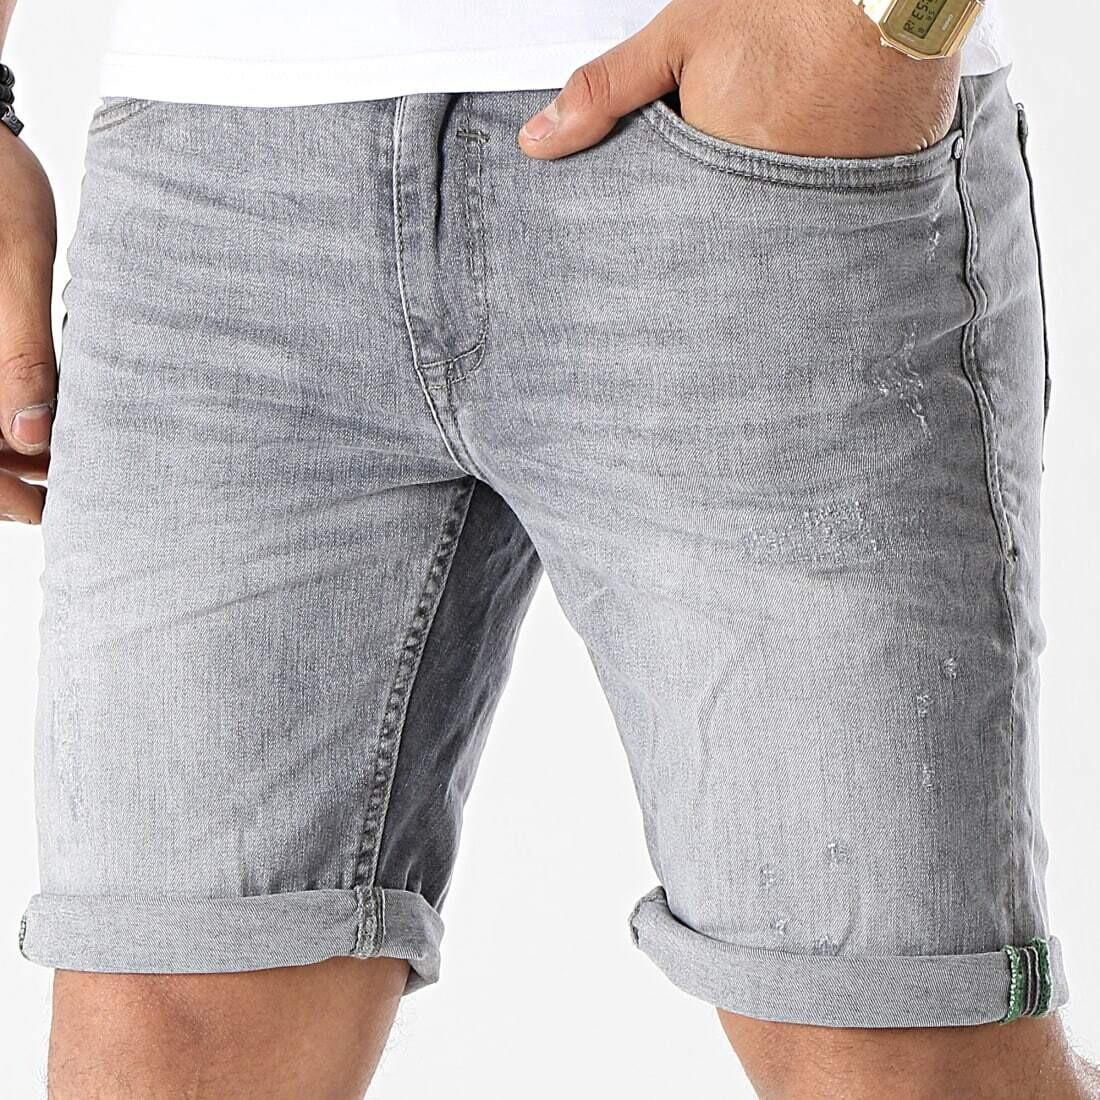 Shorts denim grigio Blend